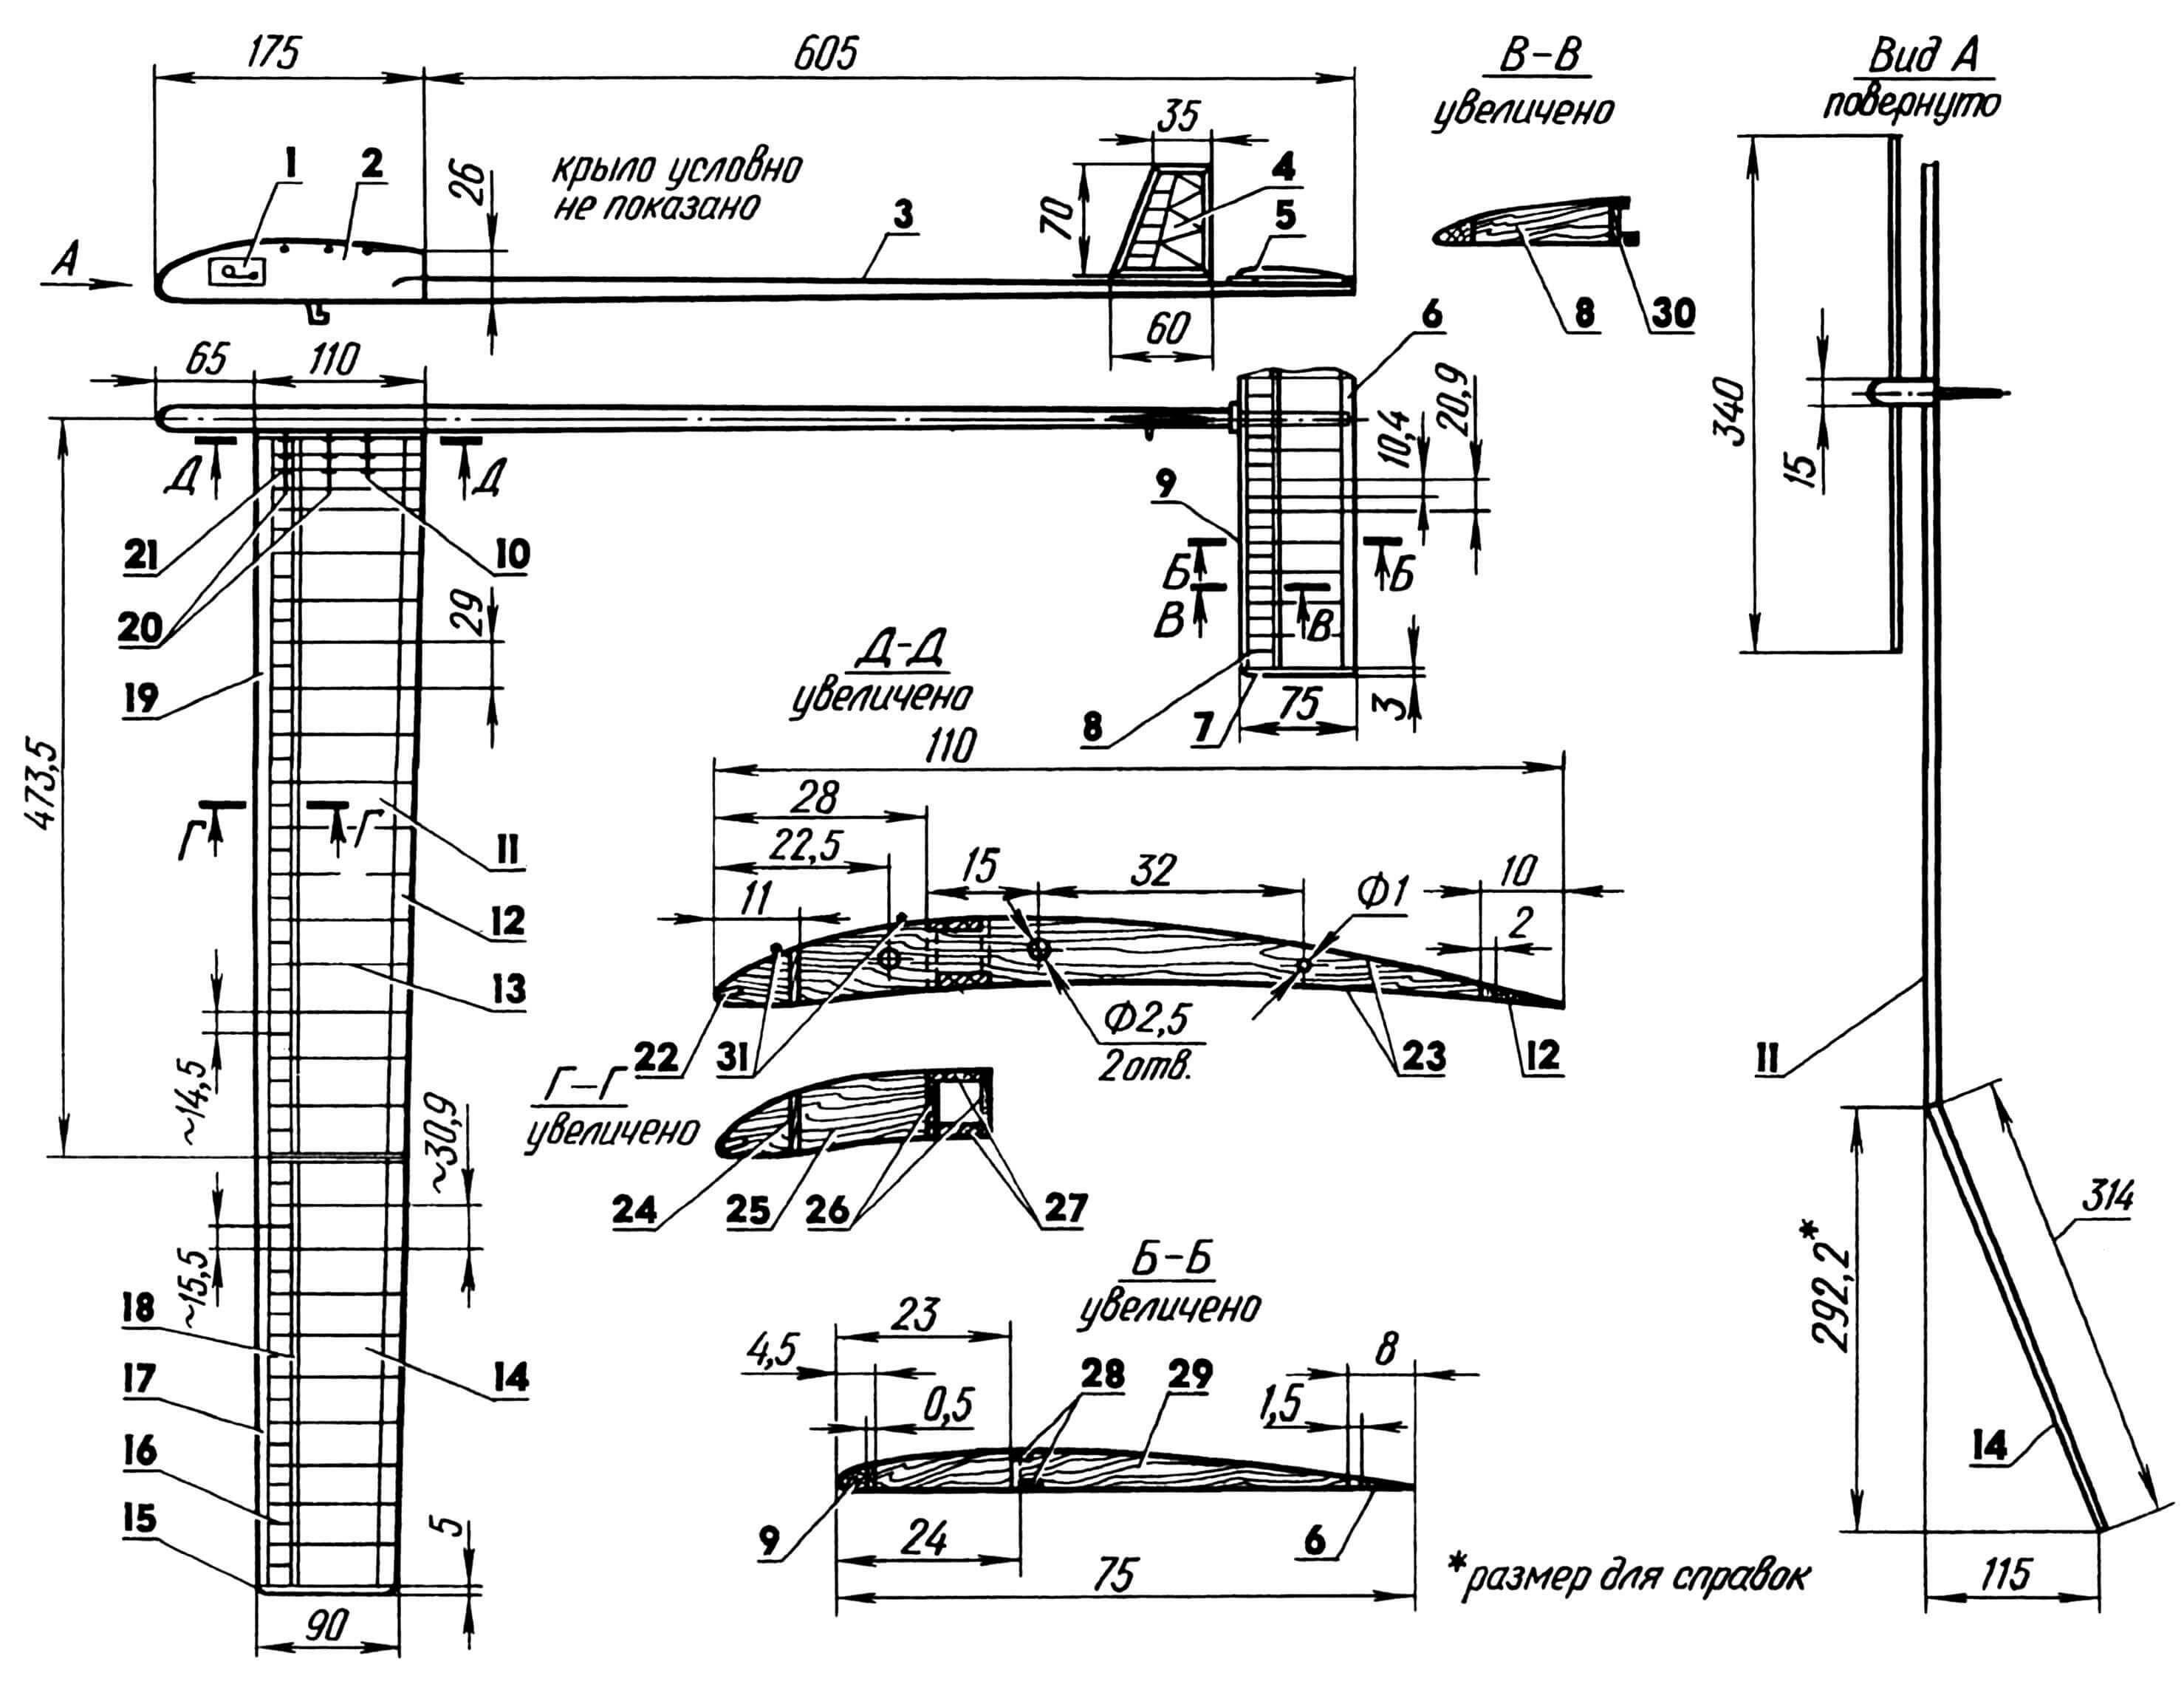 Модель планера А-1: 1 — таймер; 2 — пилон; 3 — балка хвостовая; 4 — киль; 5 — стабилизатор; 6 — кромка стабилизатора, задняя (бальза); 7 — законцовка стабилизатора (бальза s3); 8 — «носик» стабилизатора (бальза s1); 9 — кромка стабилизатора, передняя (бальза); 10 — штырь стыковочный (проволока ОВС ᴓ 1, L150); 11 — половина центроплана; 12 — кромка крыла, задняя (бальза); 13 — нервюра крыла; 14 — «ухо» крыла; 15 — законцовка крыла (бальза s5); 16 — «носик» уха (бальза s1); 17 — кессон «уха» крыла; 18 — лонжерон «уха»; 19 — кессон центроплана; 20 — штыри силовые, стыковочные (проволока ОВС ᴓ 2,5, L220); 21 — шайба (целлулоид, 18 шт.); 22 — кромка крыла, передняя (сосна 3x1); 23 — окантовка (углепластик 1x0,1); 24 — стенка кессона крыла (бальза s1); 25 — «носик» центроплана (бальза s1); 26 — стенки лонжерона крыла, силовые (бальза s1); 27 — полки лонжерона центроплана; 28 — полки лонжерона стабилизатора (сосна 2x0,9); 29 — нервюра стабилизатора (бальза s1); 30 — стенка лонжерона стабилизатора, силовая (бальза s1); 31 — турбулизаторы (нить ᴓ 0,6).